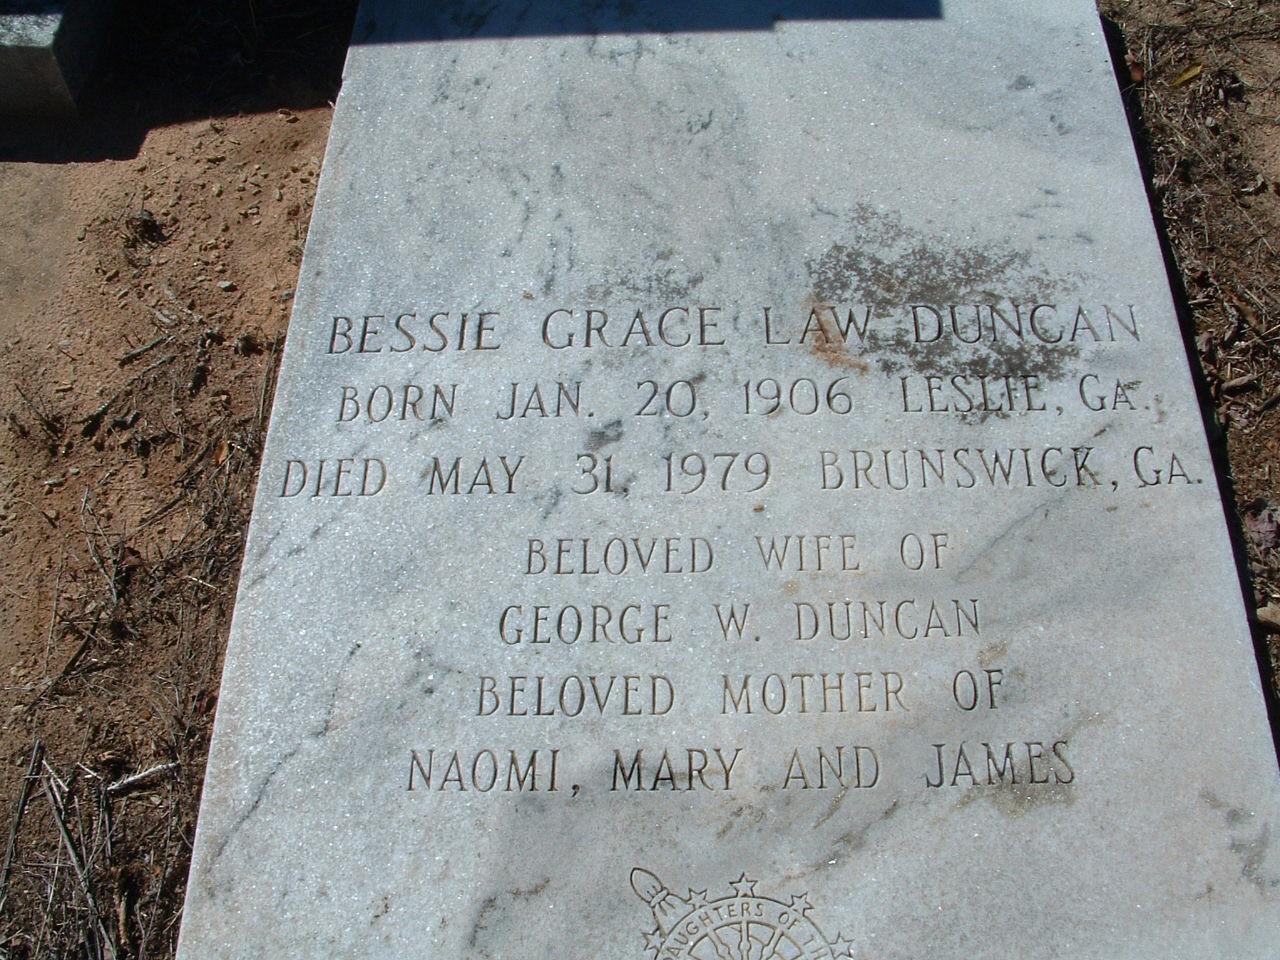 Bessie Grace Law